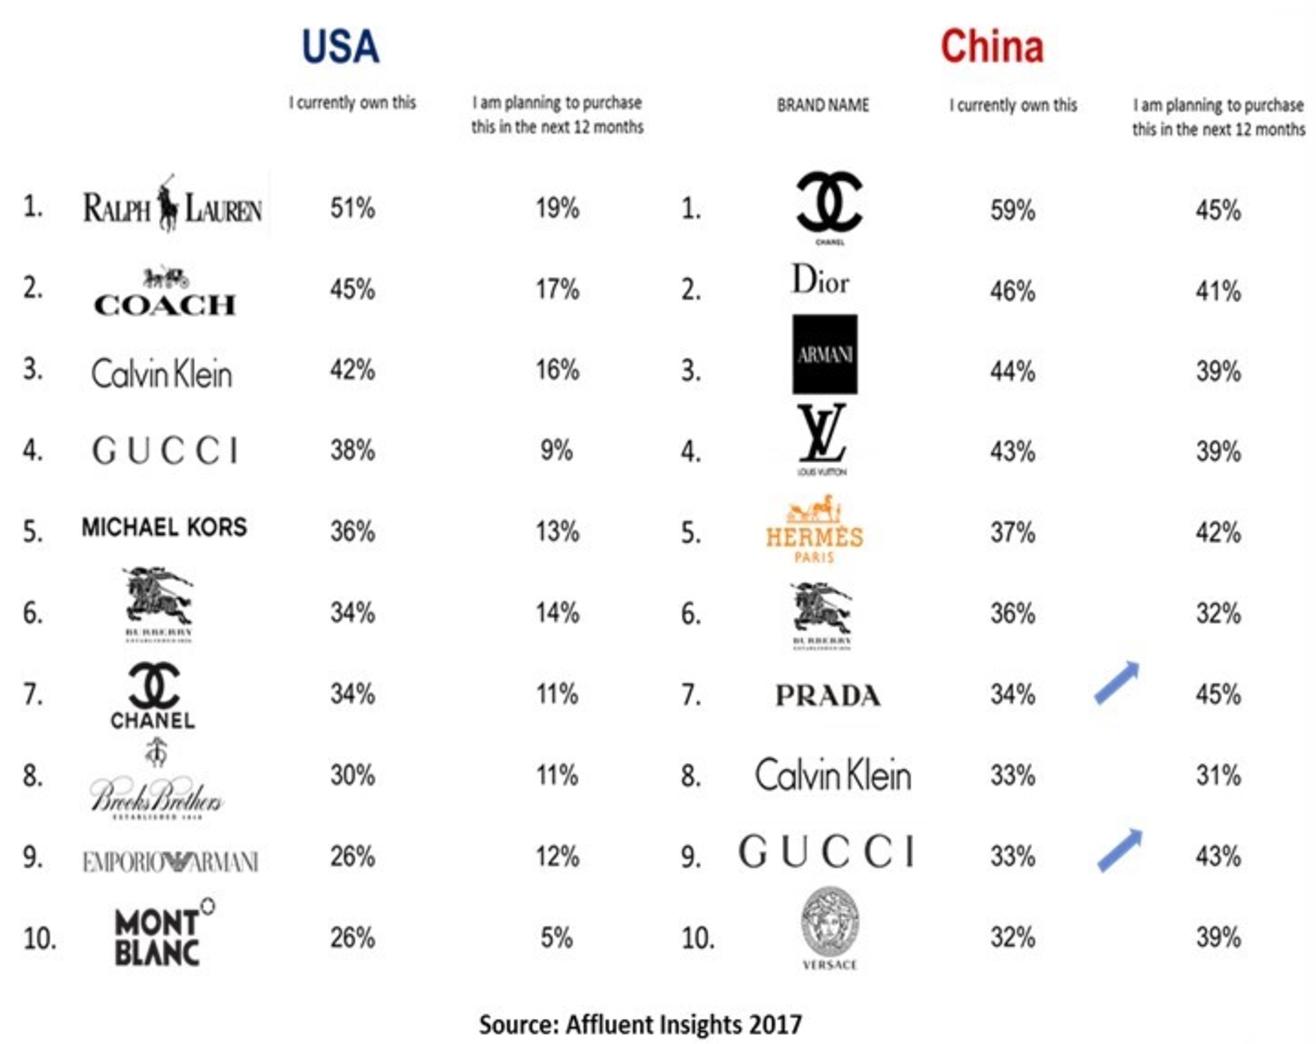 Comparing luxury brands in China vs. U.S.